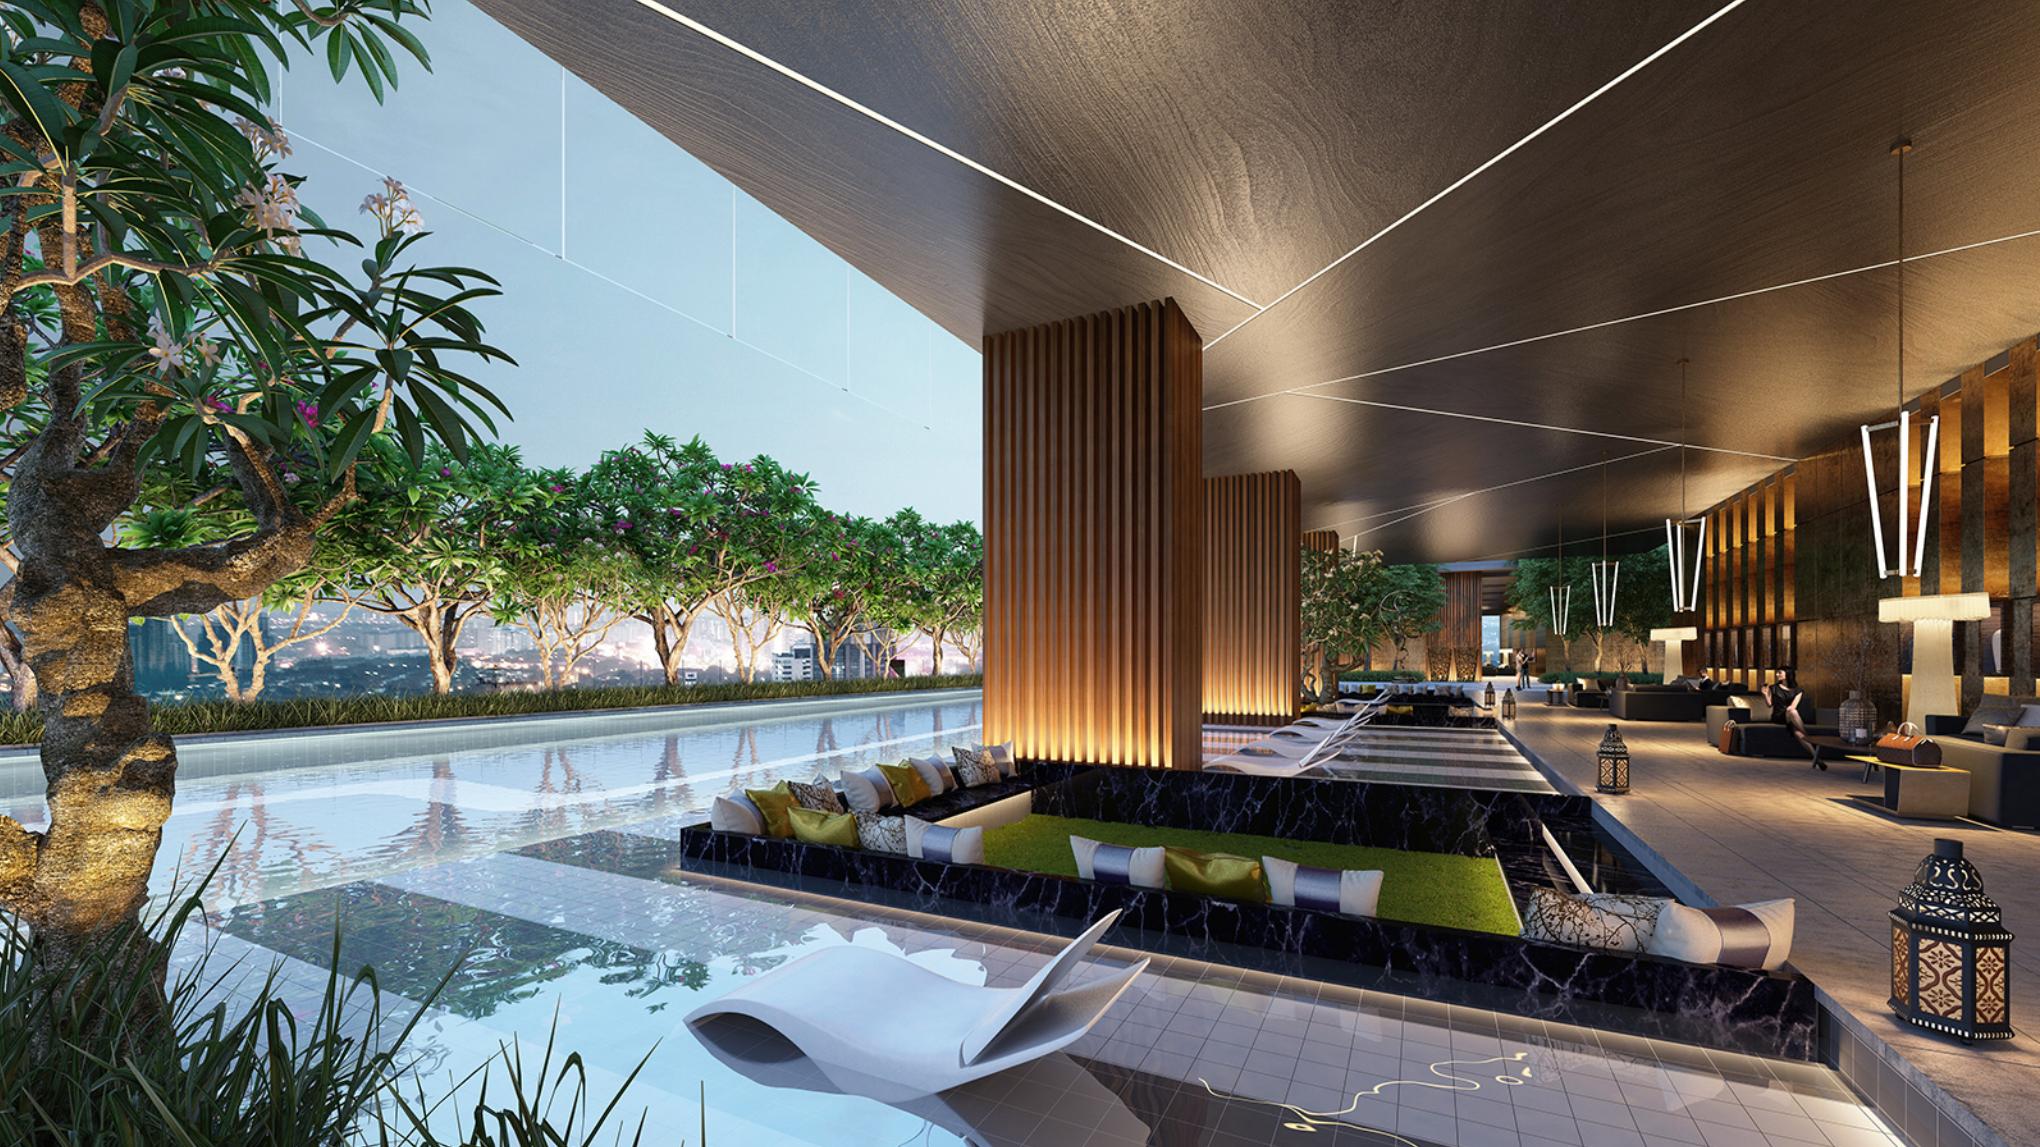 aria-luxury-residence-klcc-facade-new-propeerety-5